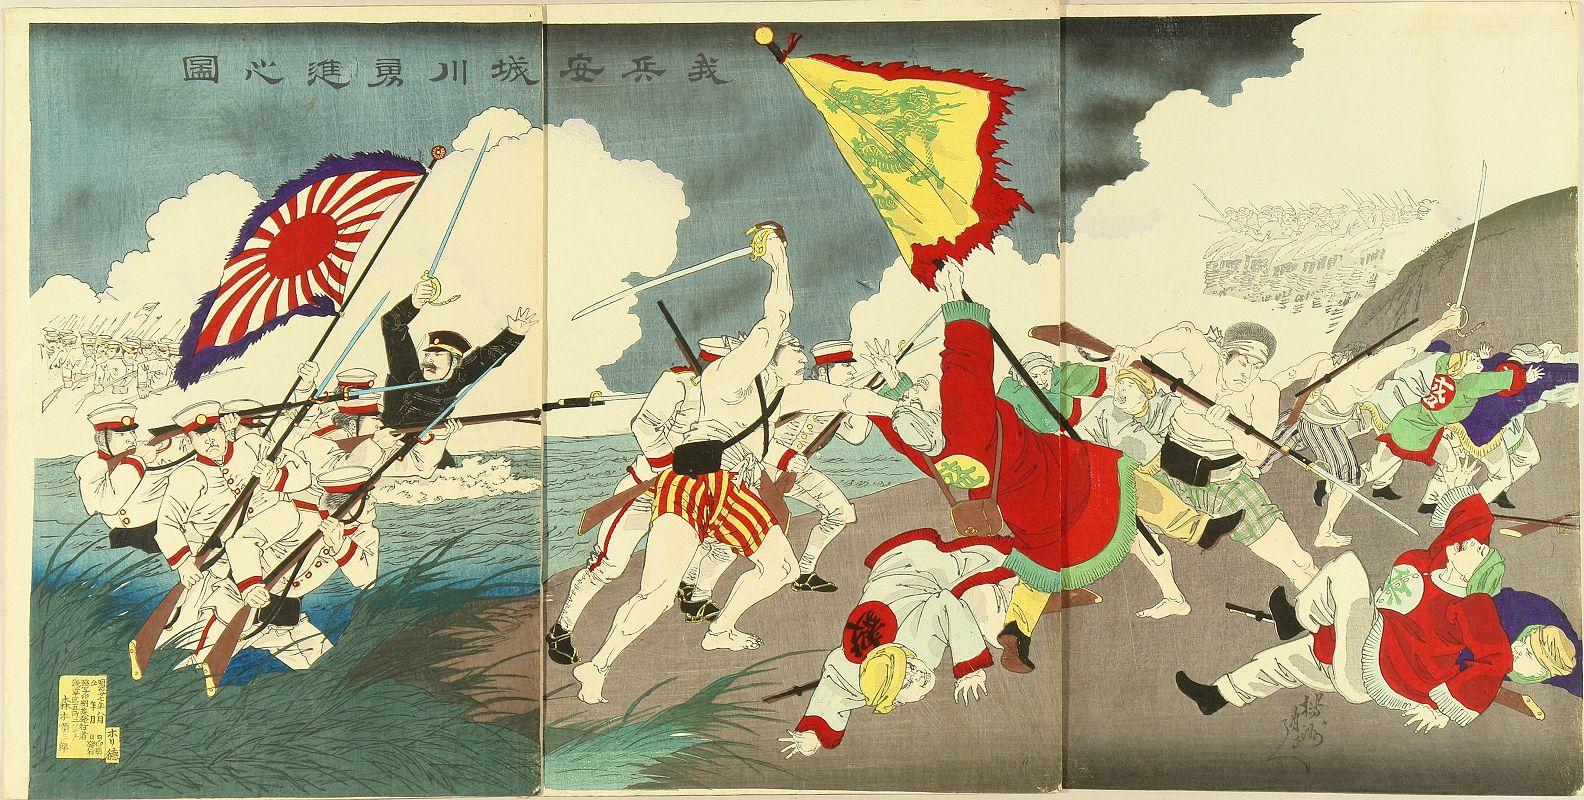 File:Y%C5%8Dsh%C5%AB_Chikanobu_Sino Japanese_War on Us History Imperialism